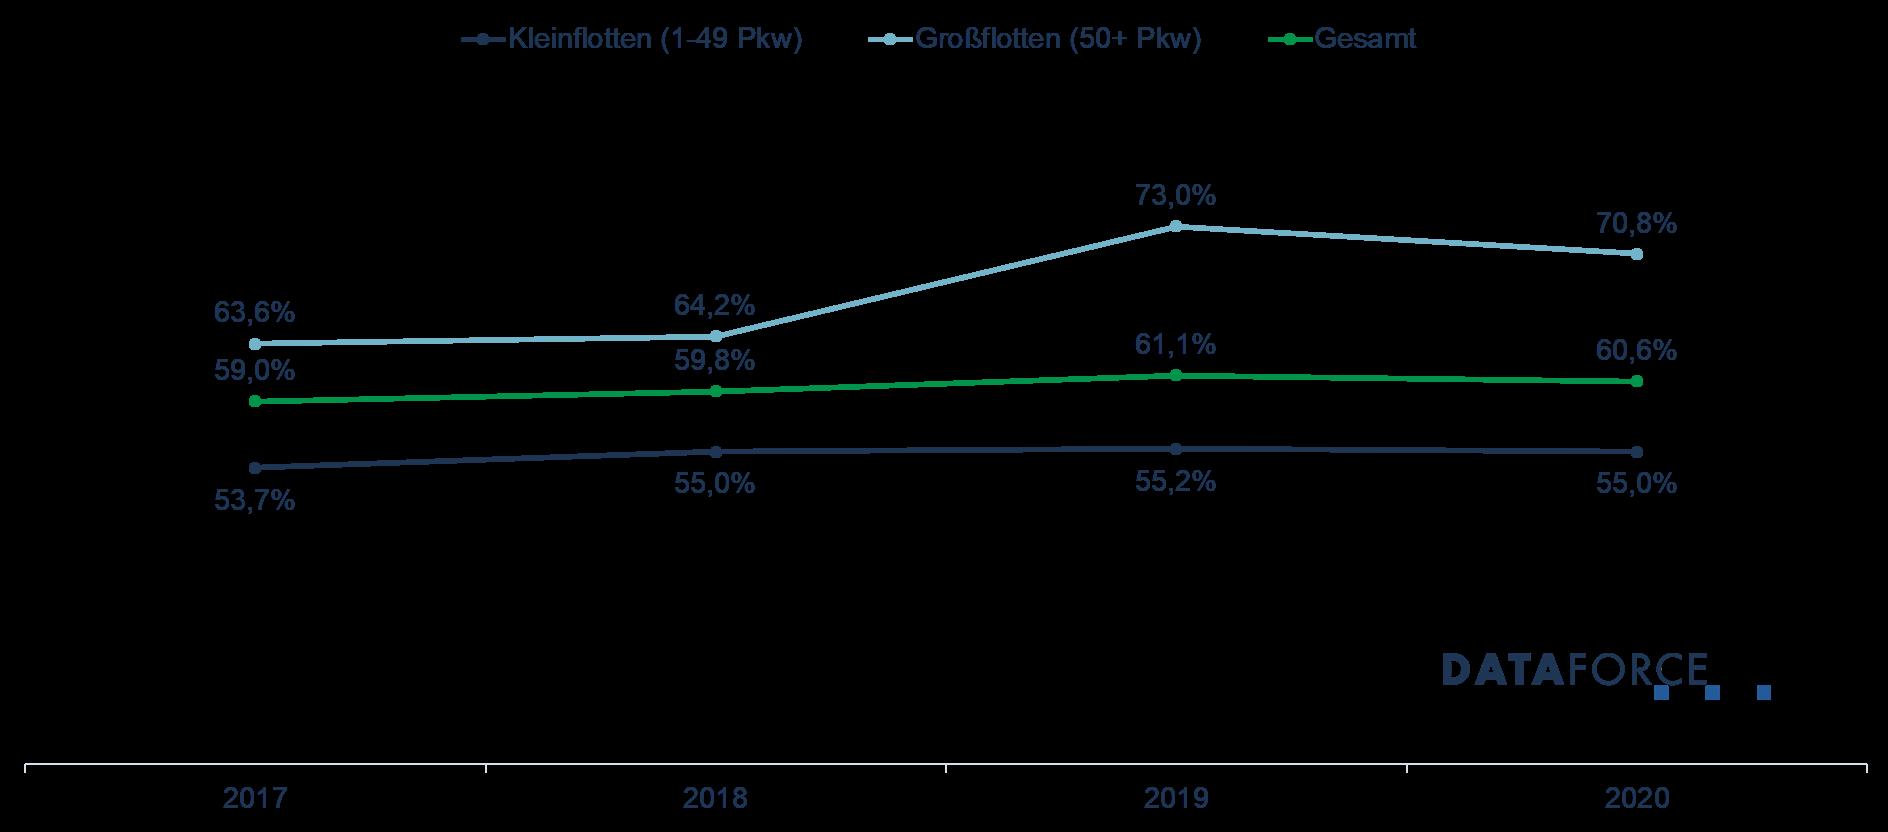 Dataforce Infografik Leasing-Analyse 2017-2020 nach Größe der Flotte